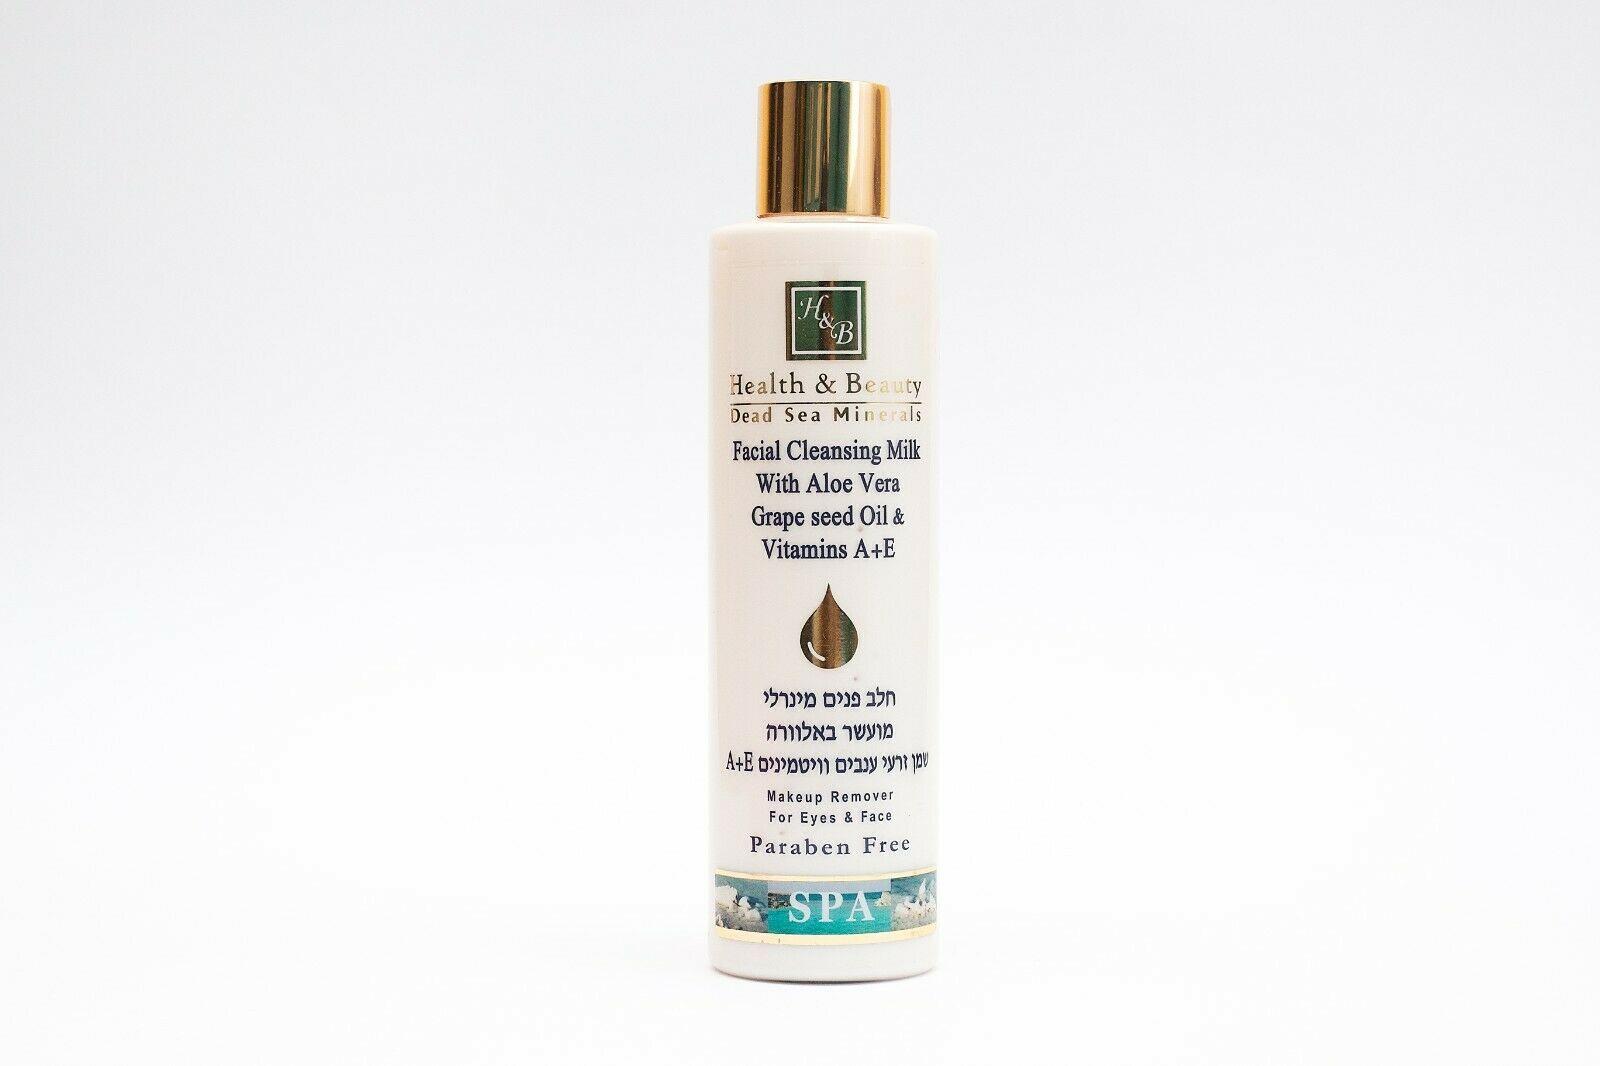 Health & Beauty Dead Sea Minerals Facial Cleansing Milk With Aloe Vera Grape Seed Oil & Vitamins A+E